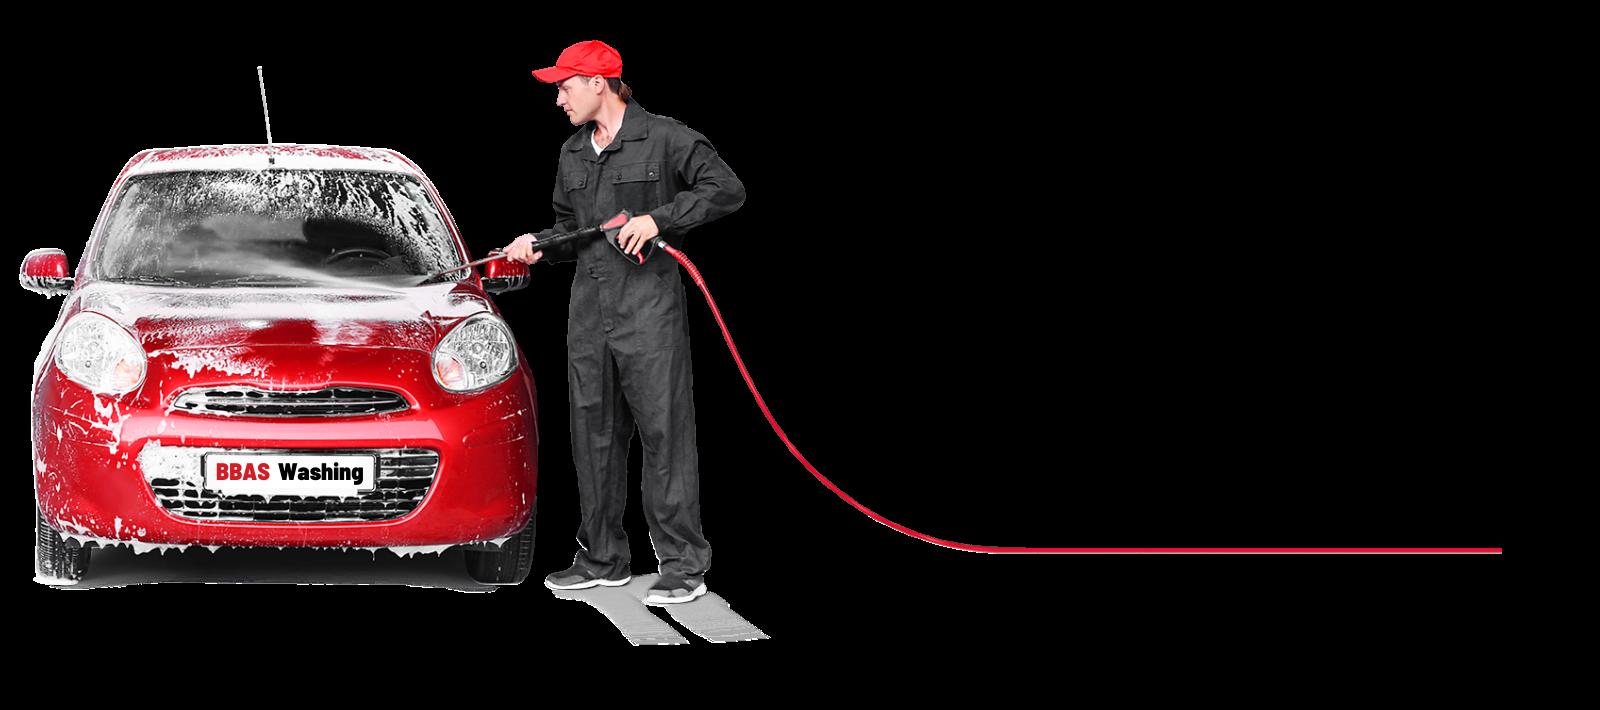 Big Boyz Auto Services washer